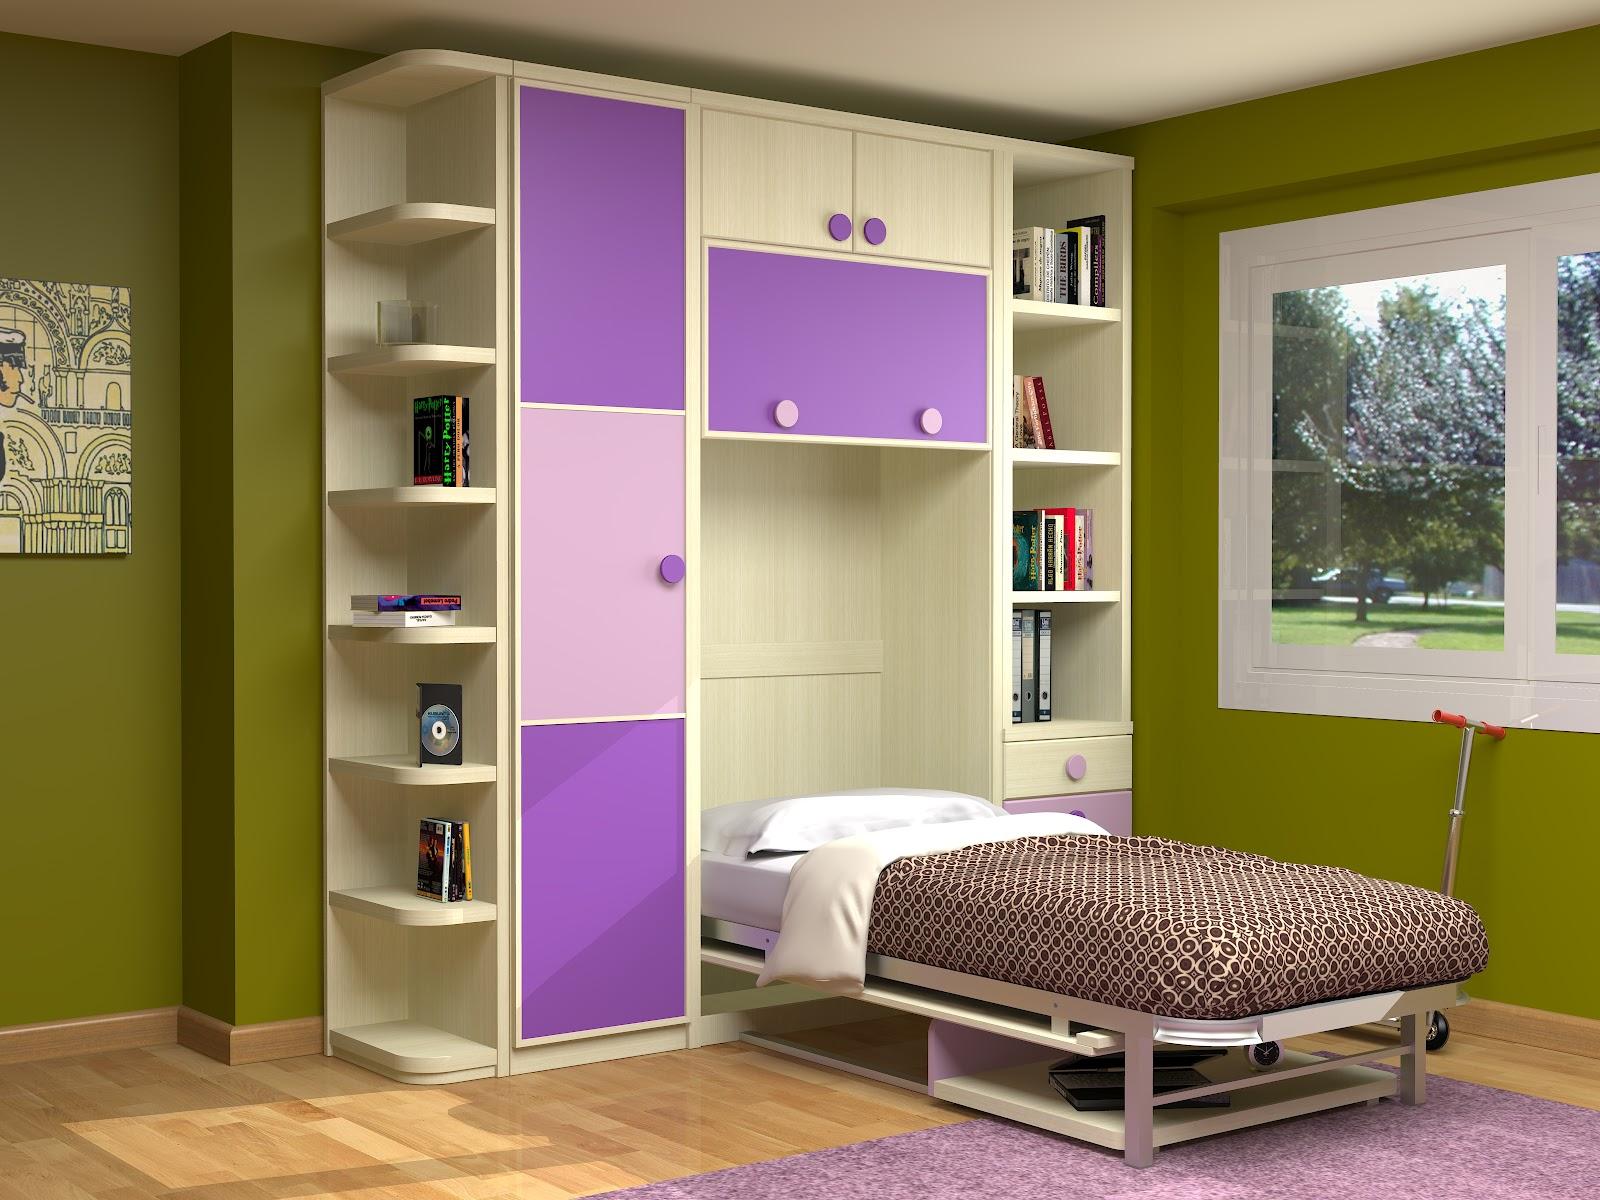 Camas abatibles en madrid camas abatibles toledo for Camas juveniles con escritorio incorporado